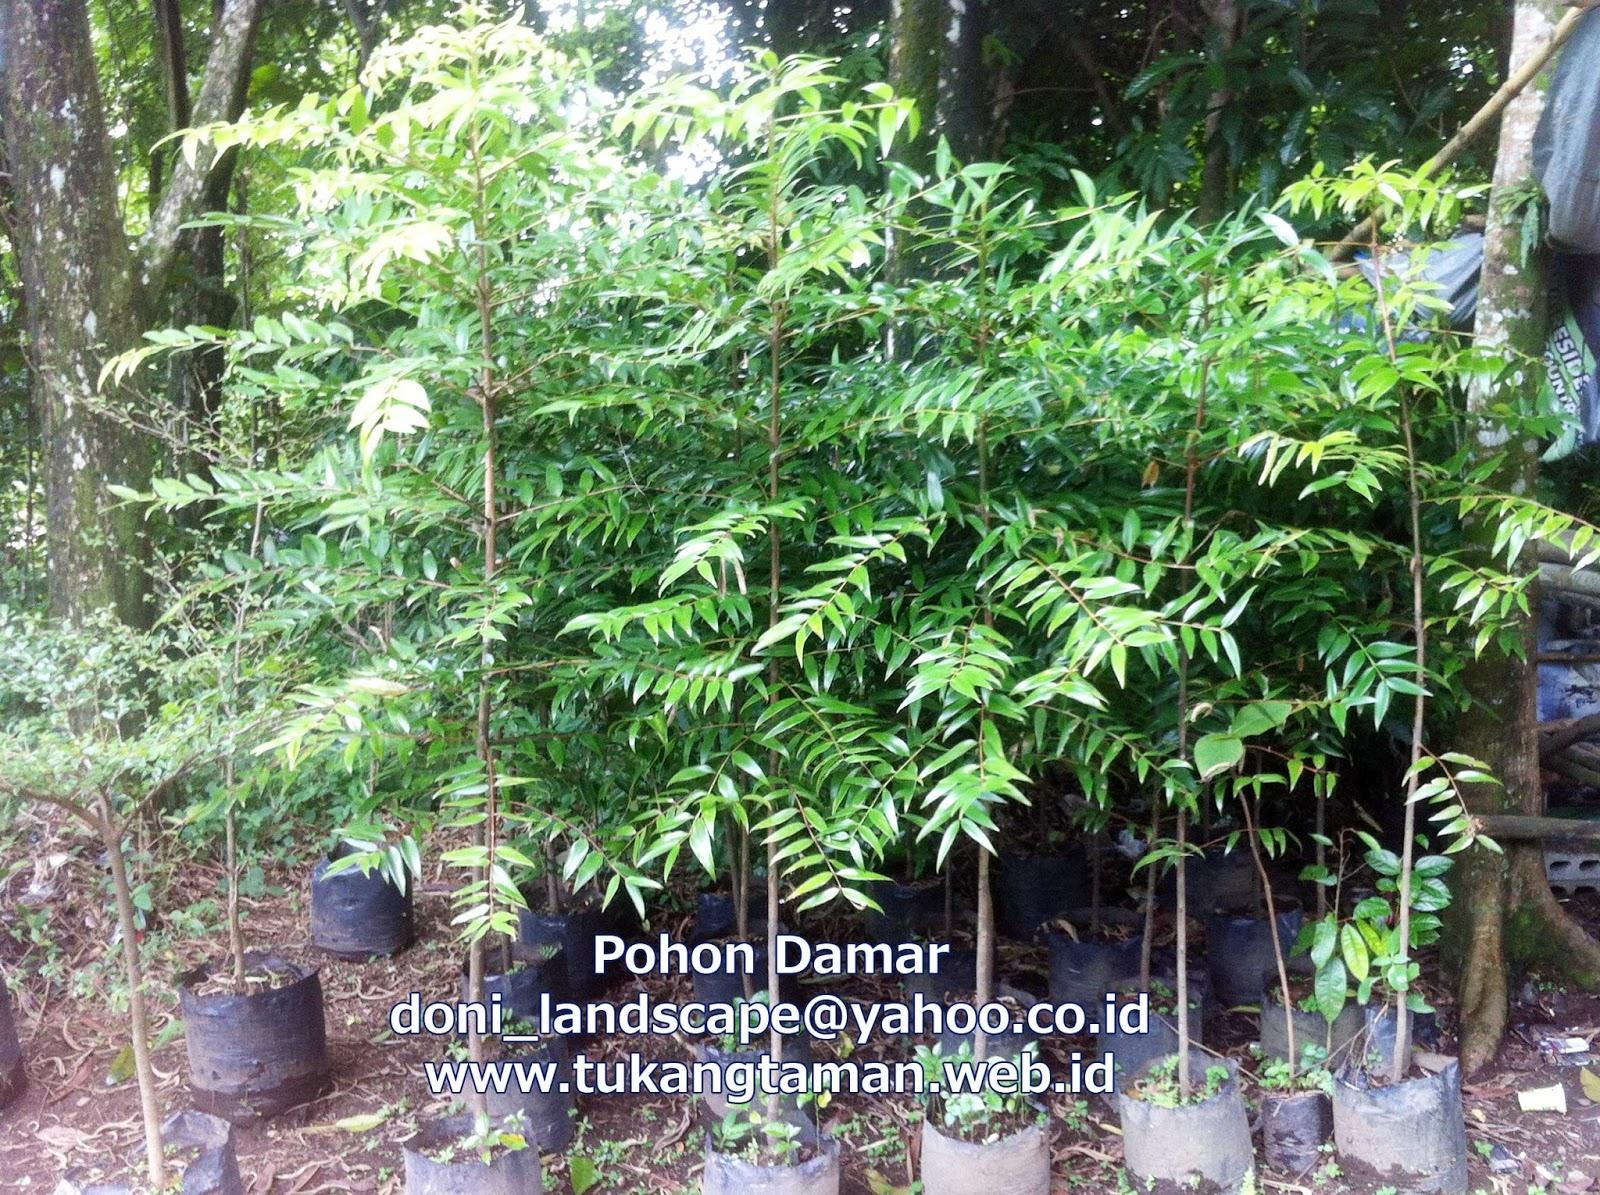 Jual Bibit Pohon Damar Agathis Dammara Tukang Taman